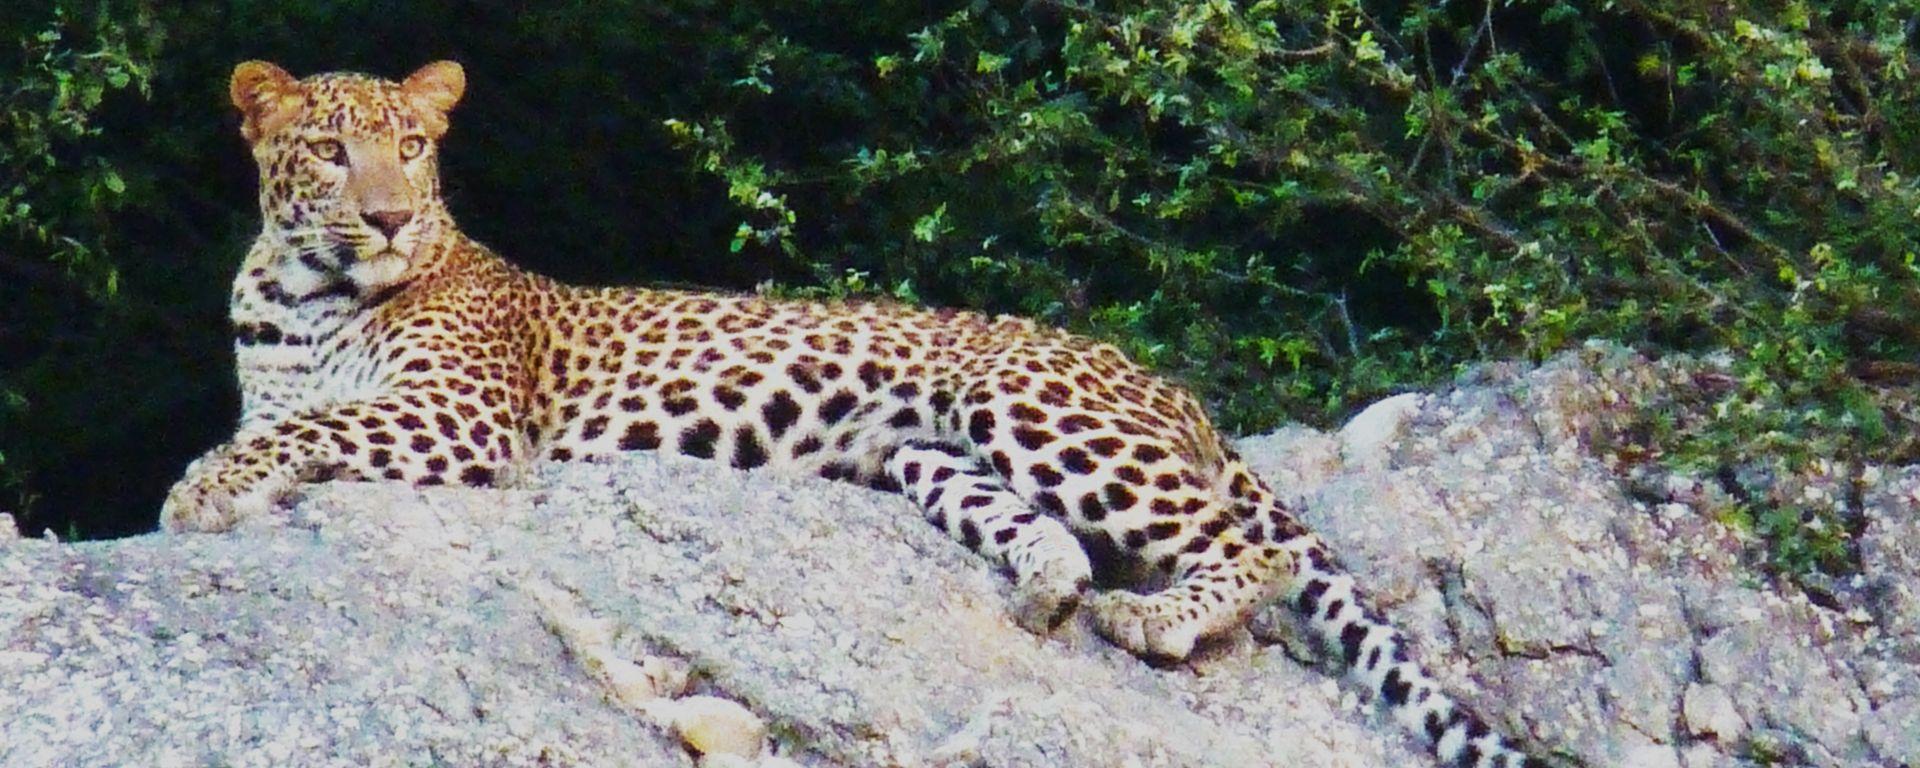 Leopards of Bera, Rajasthan http://www.tripoto.com/trip/leopards-of-bera-rajasthan-157466  #Airplane #travel #wildlife